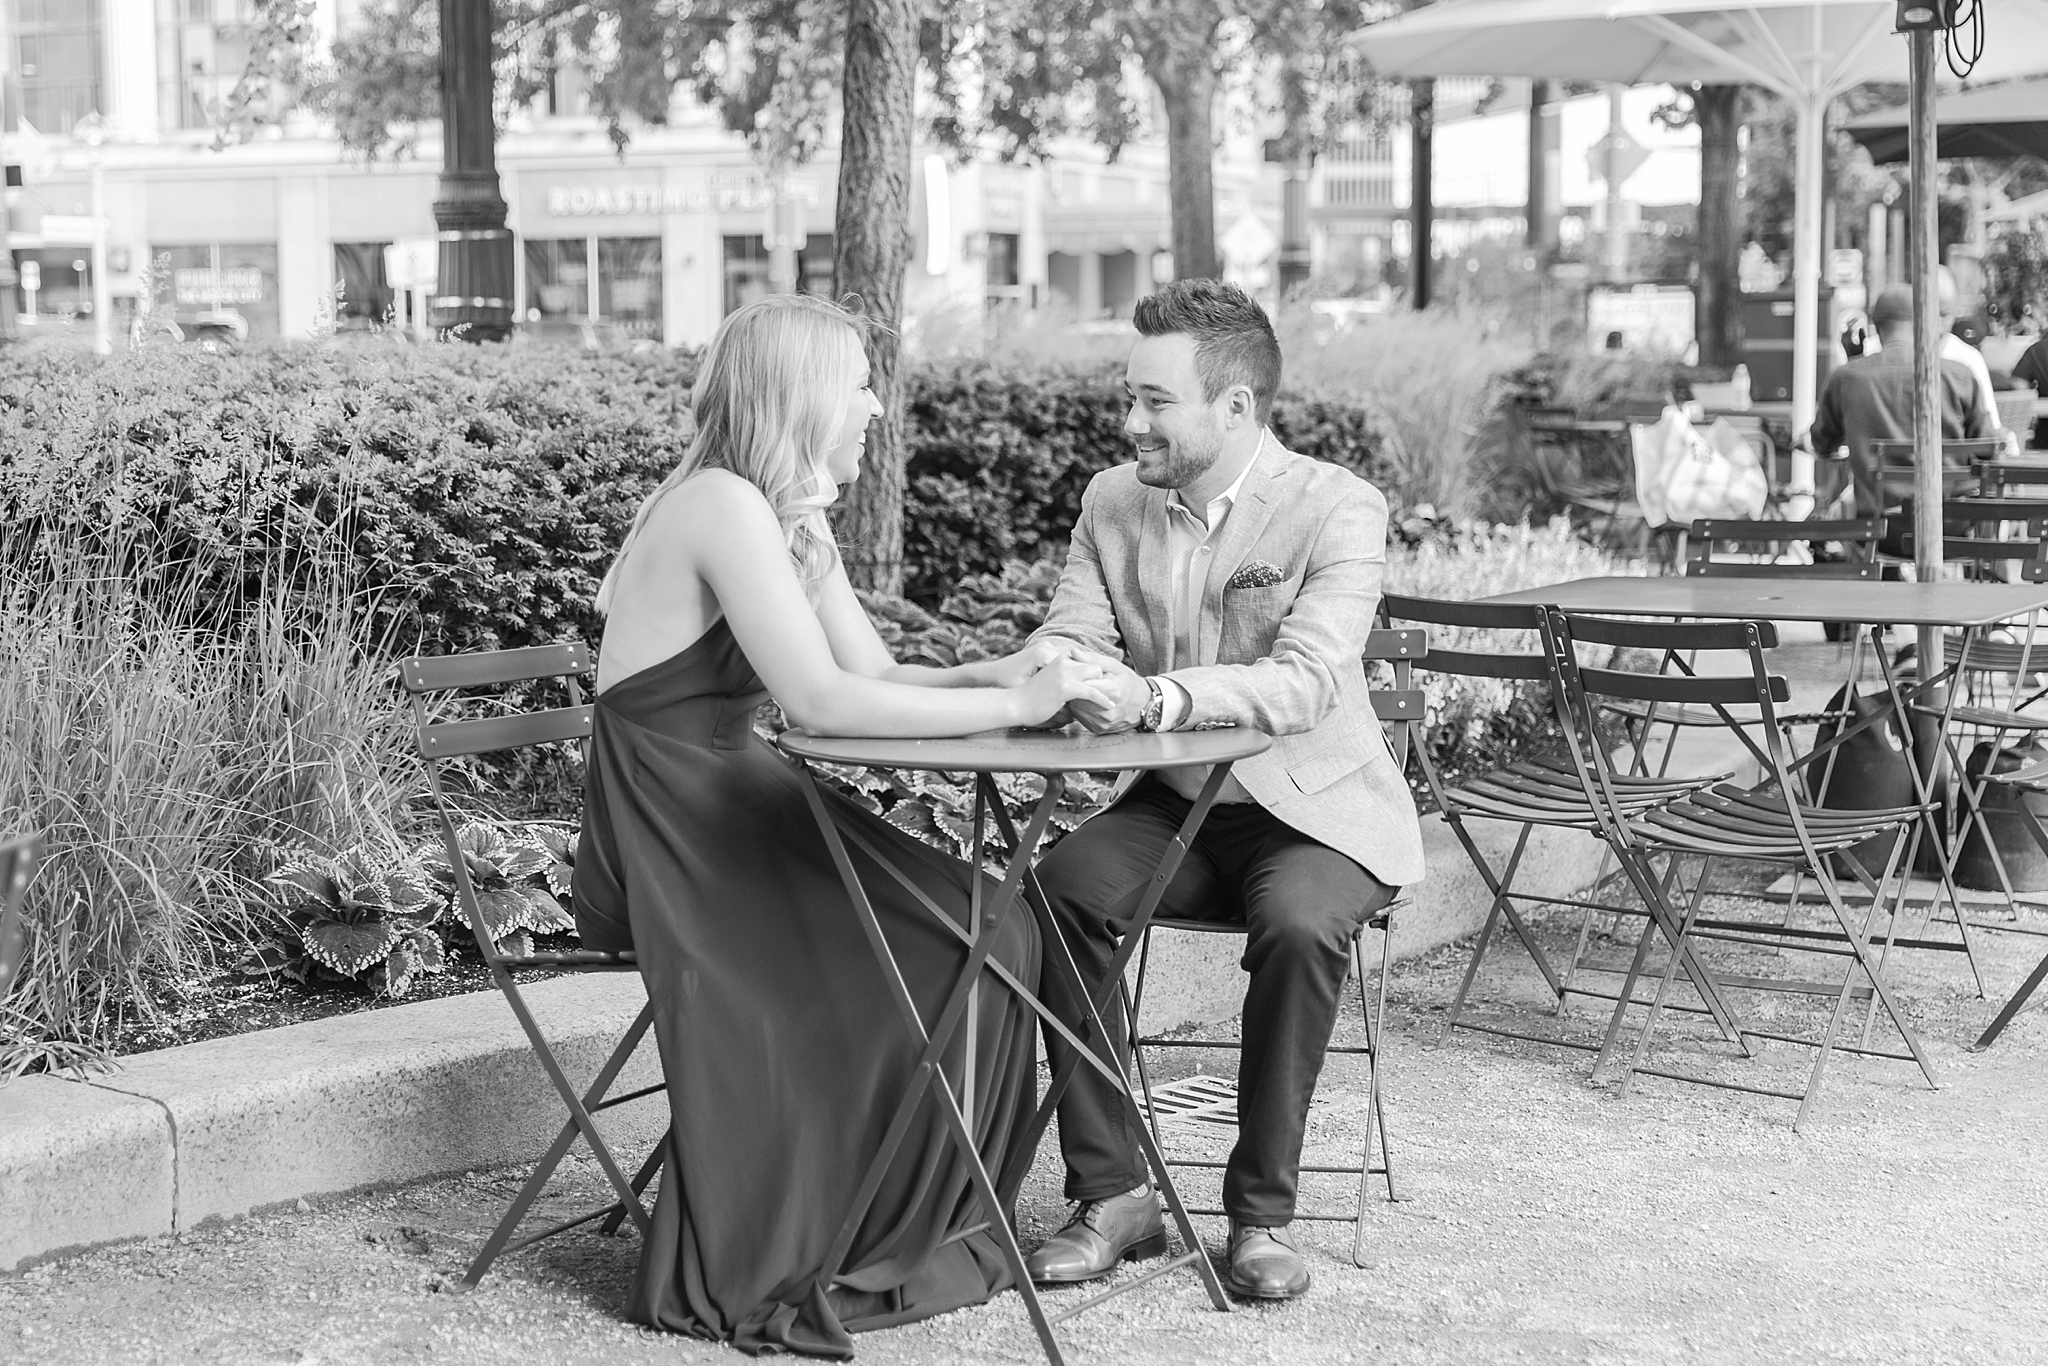 detroit-wedding-photographer-downtown-detroit-belle-isle-engagement-photos-sarah-eric-by-courtney-carolyn-photography_0020.jpg